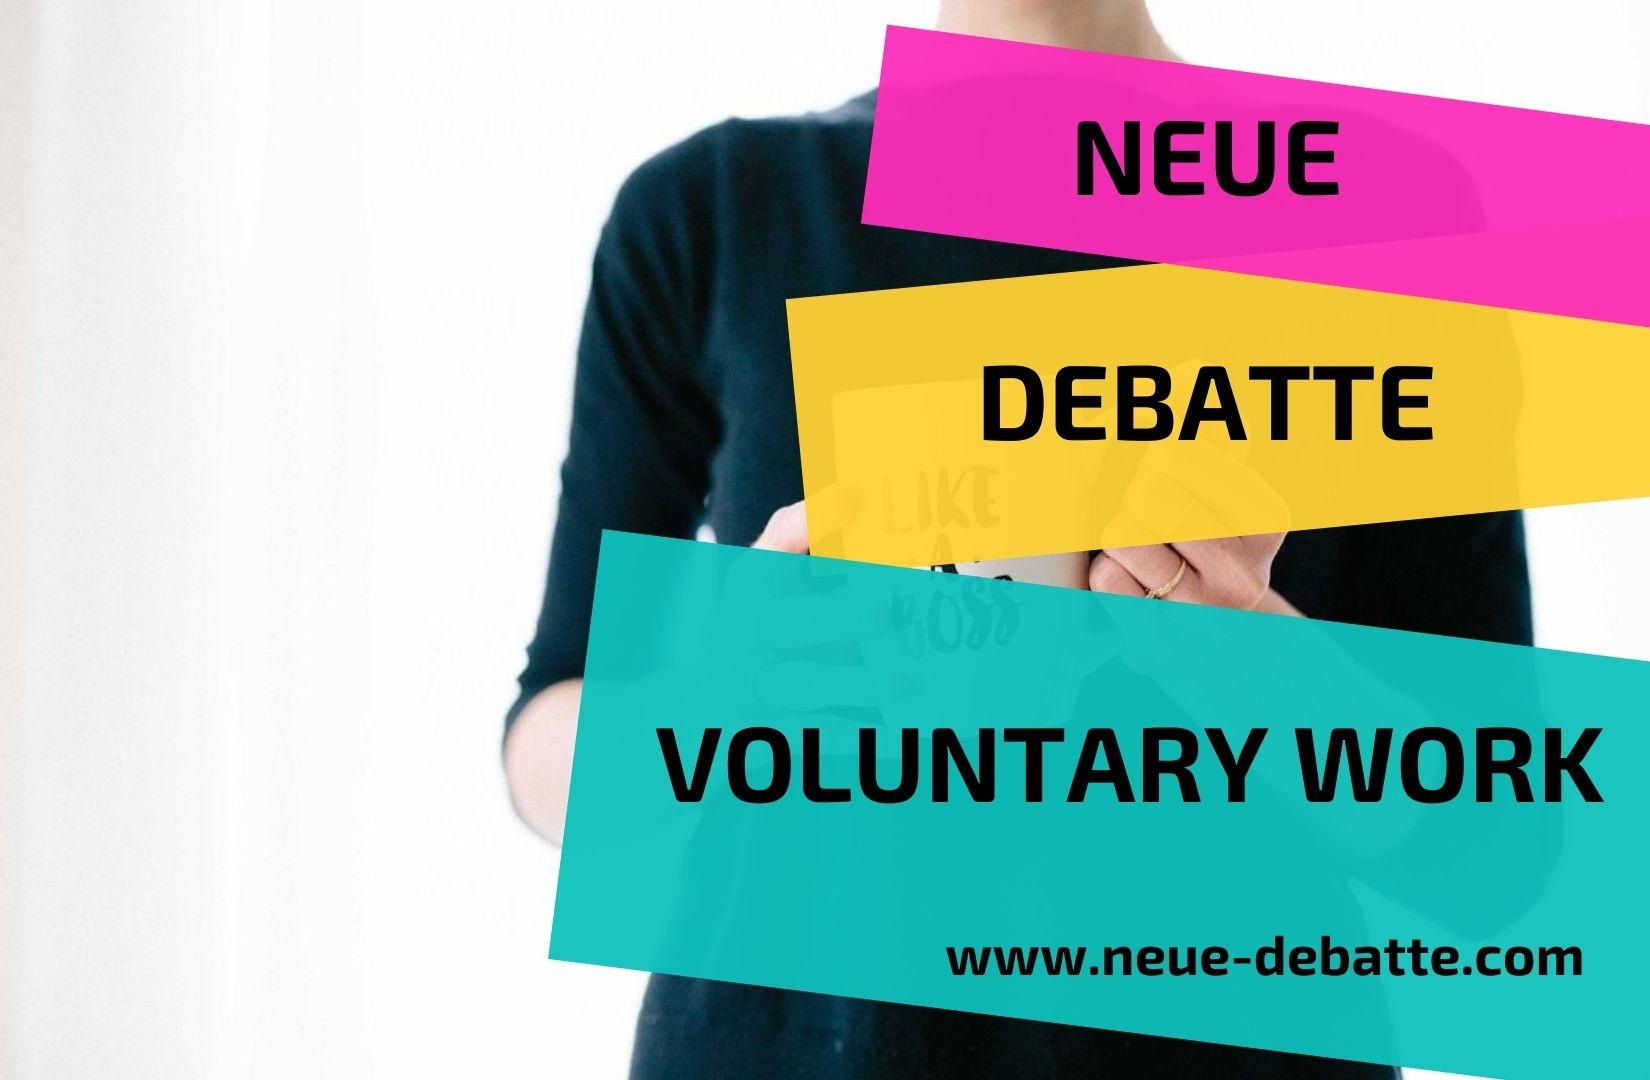 Neue Debatte Voluntary Work